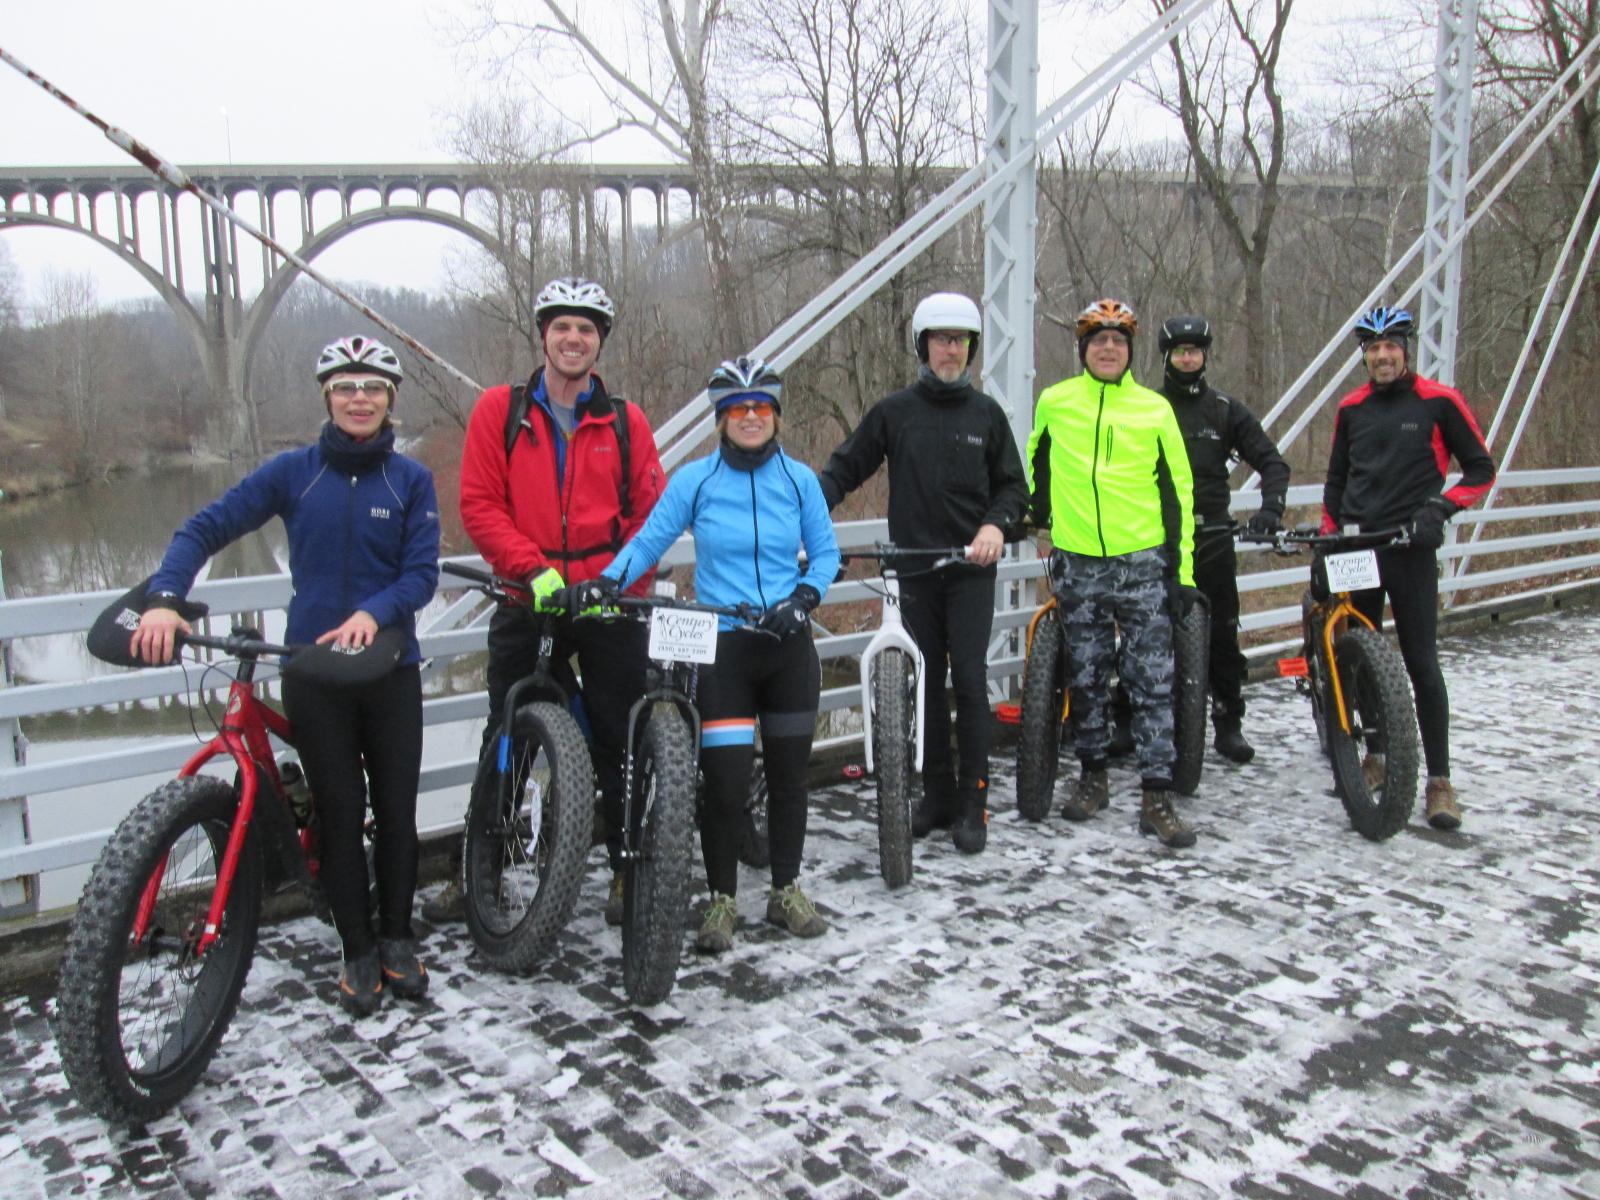 ca9f7520abd Global Fat Bike Day Ride  Dec. 5